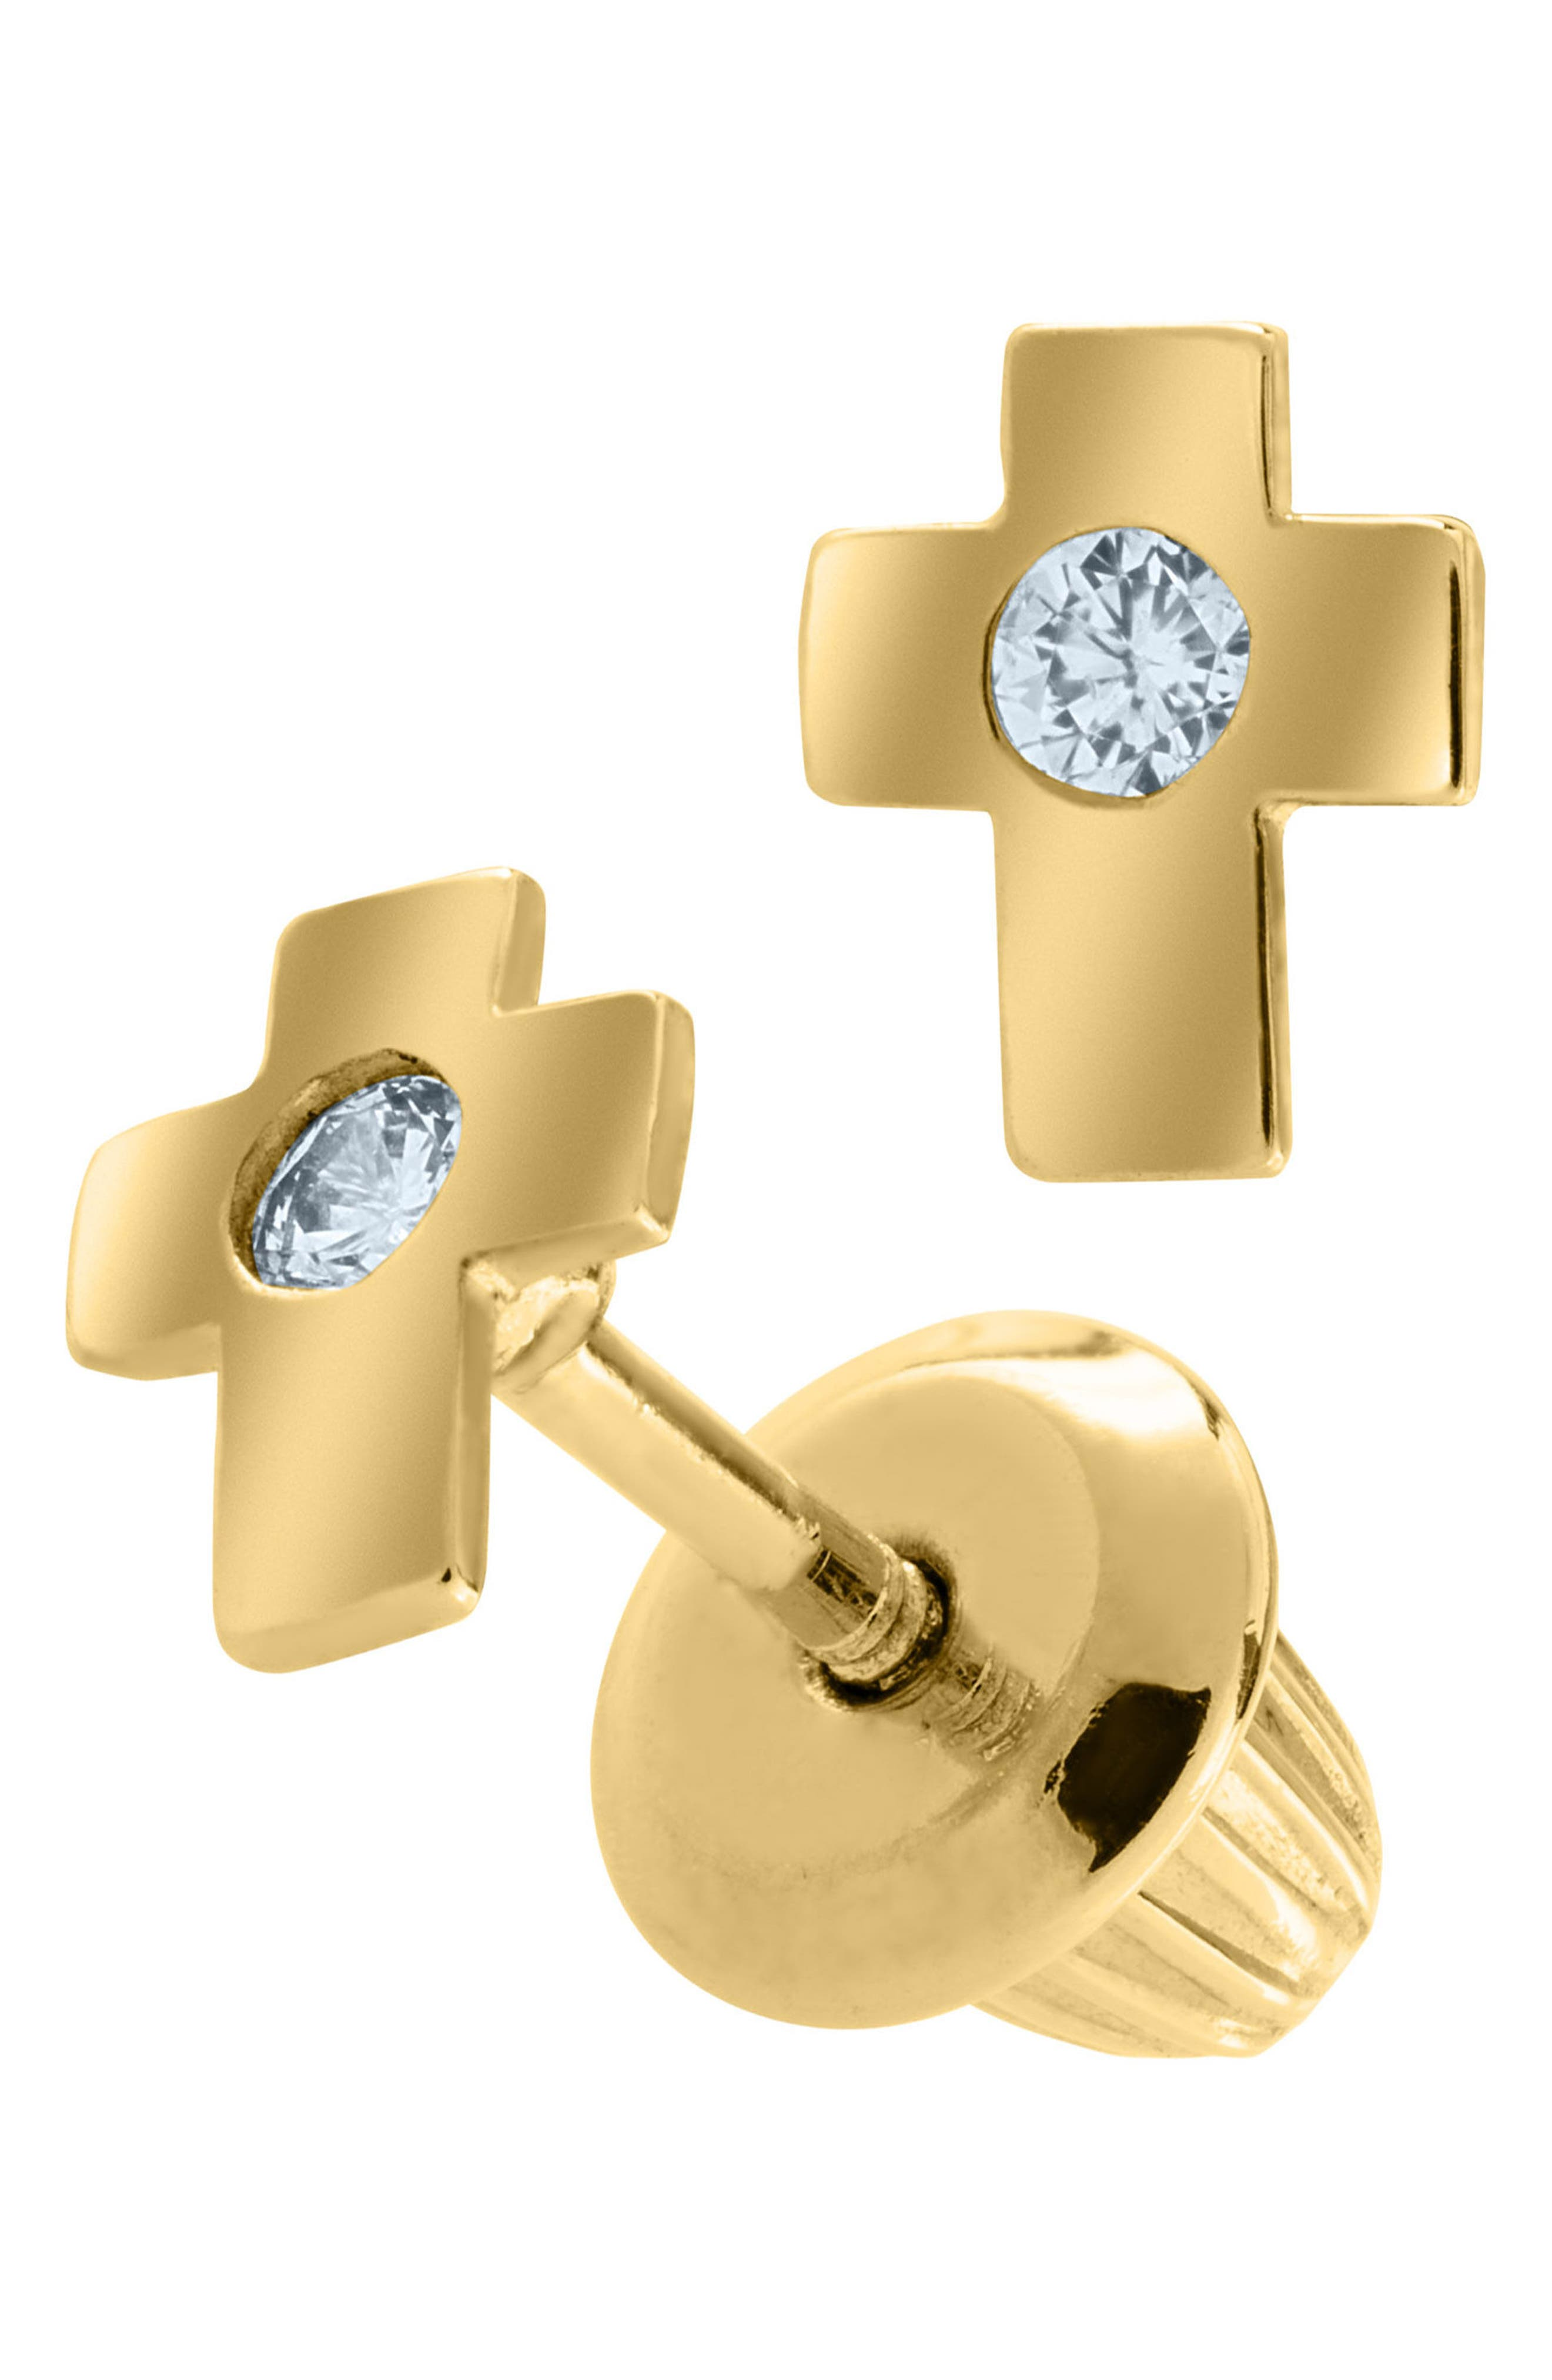 cross earrings | Nordstrom